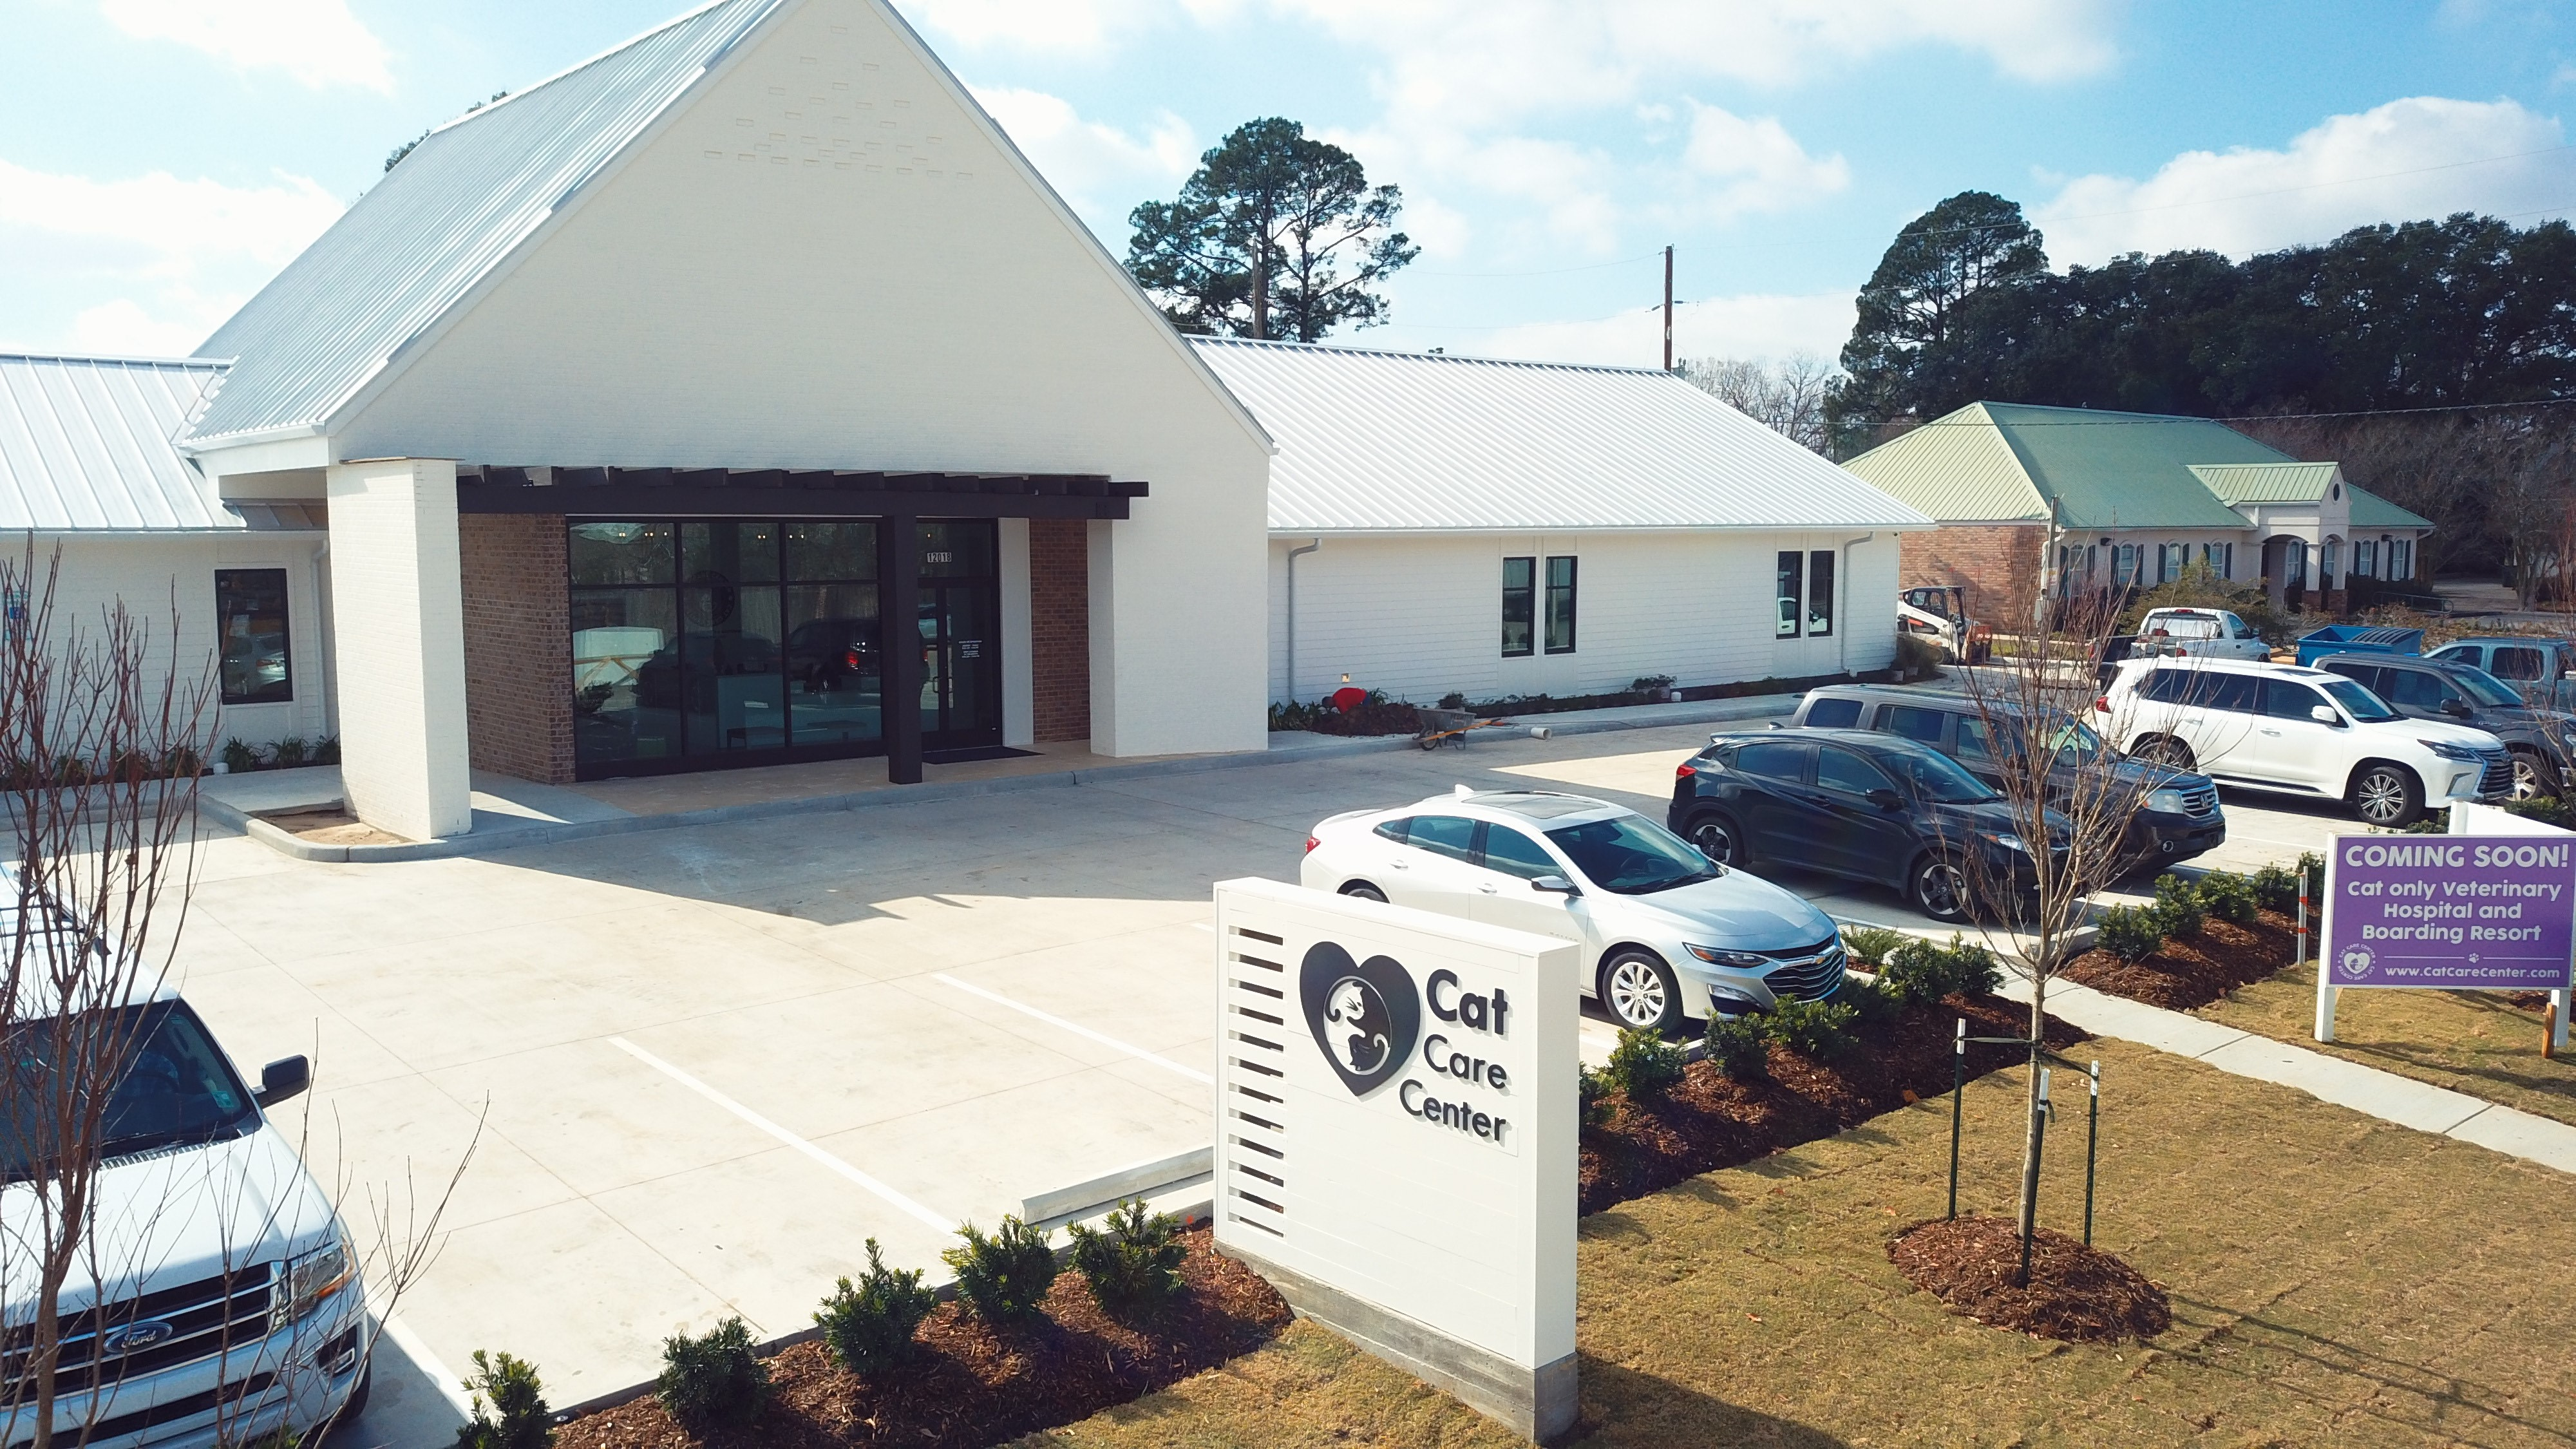 Cat Care Center Baton Rouge, Louisiana